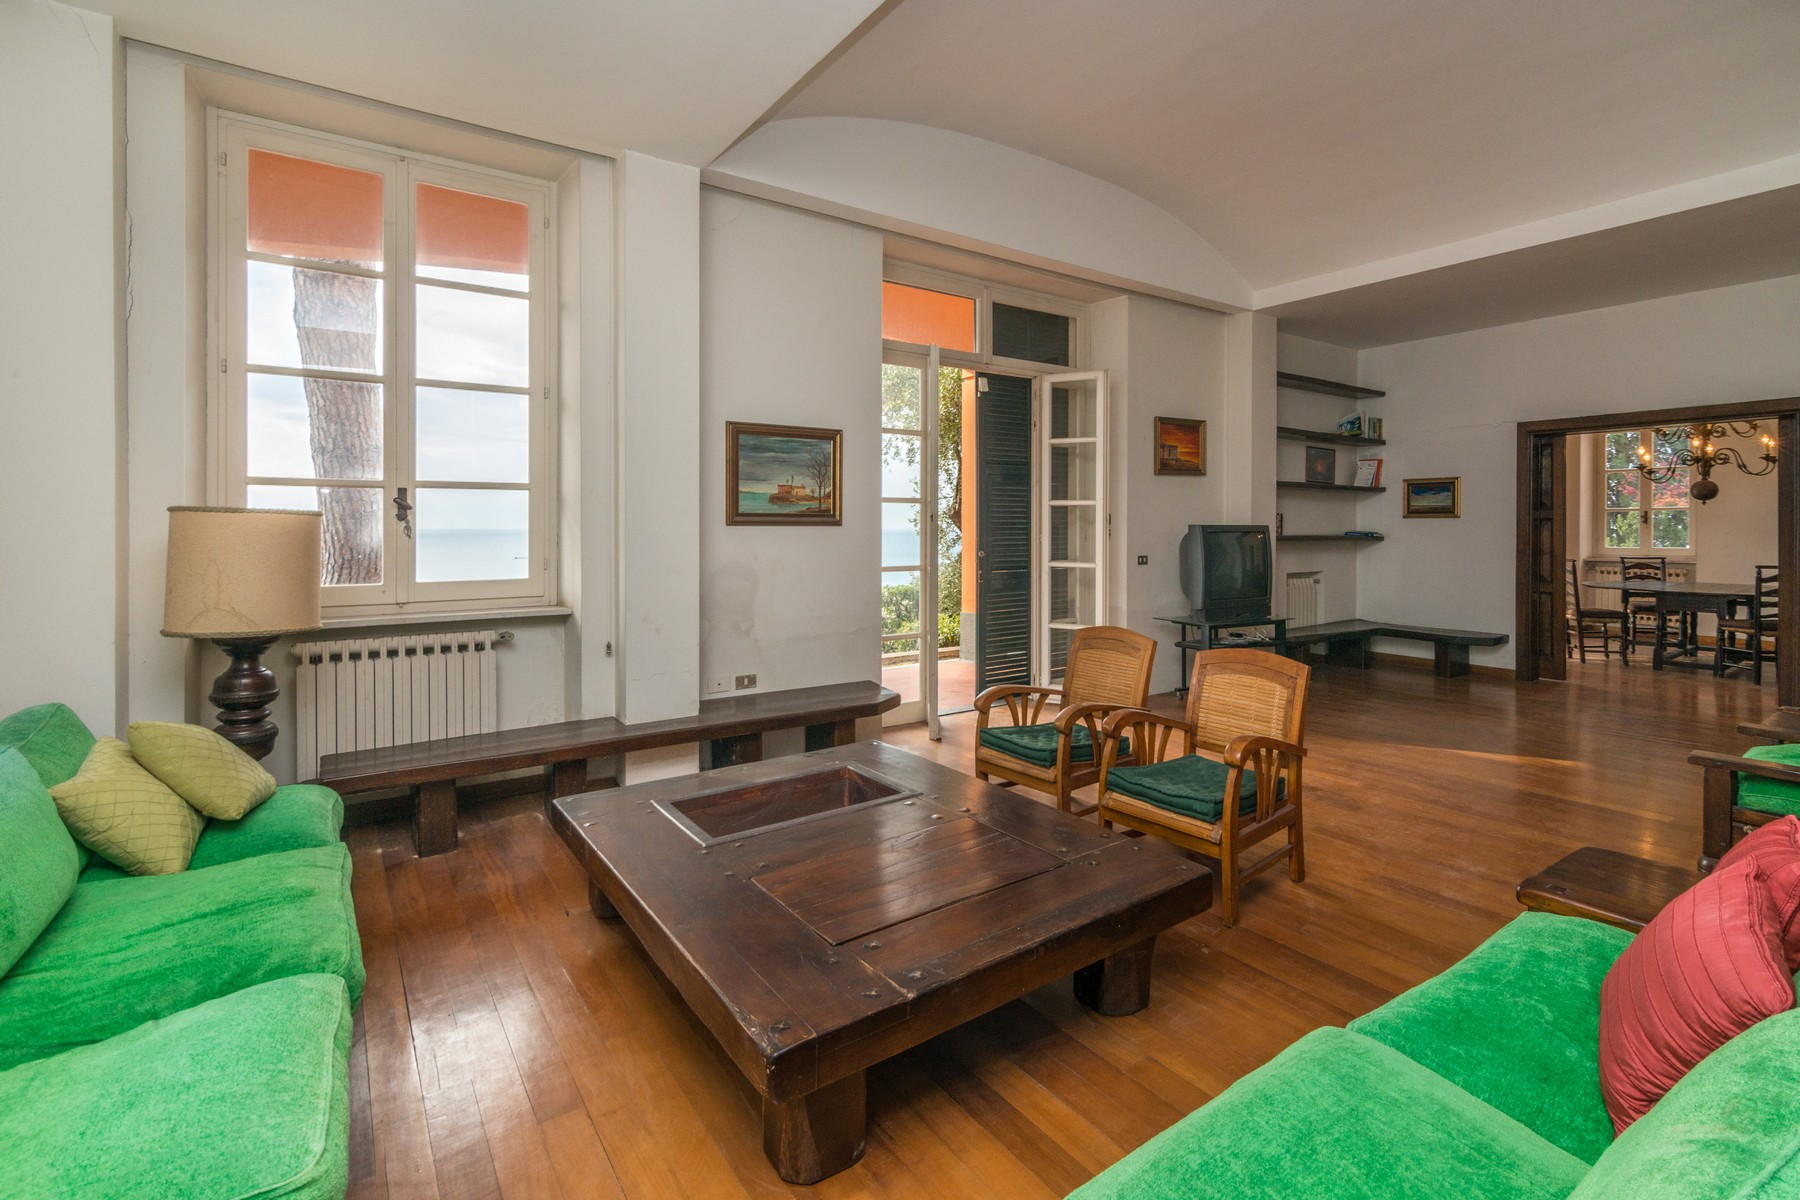 Villa in Vendita a Sori: 5 locali, 720 mq - Foto 8